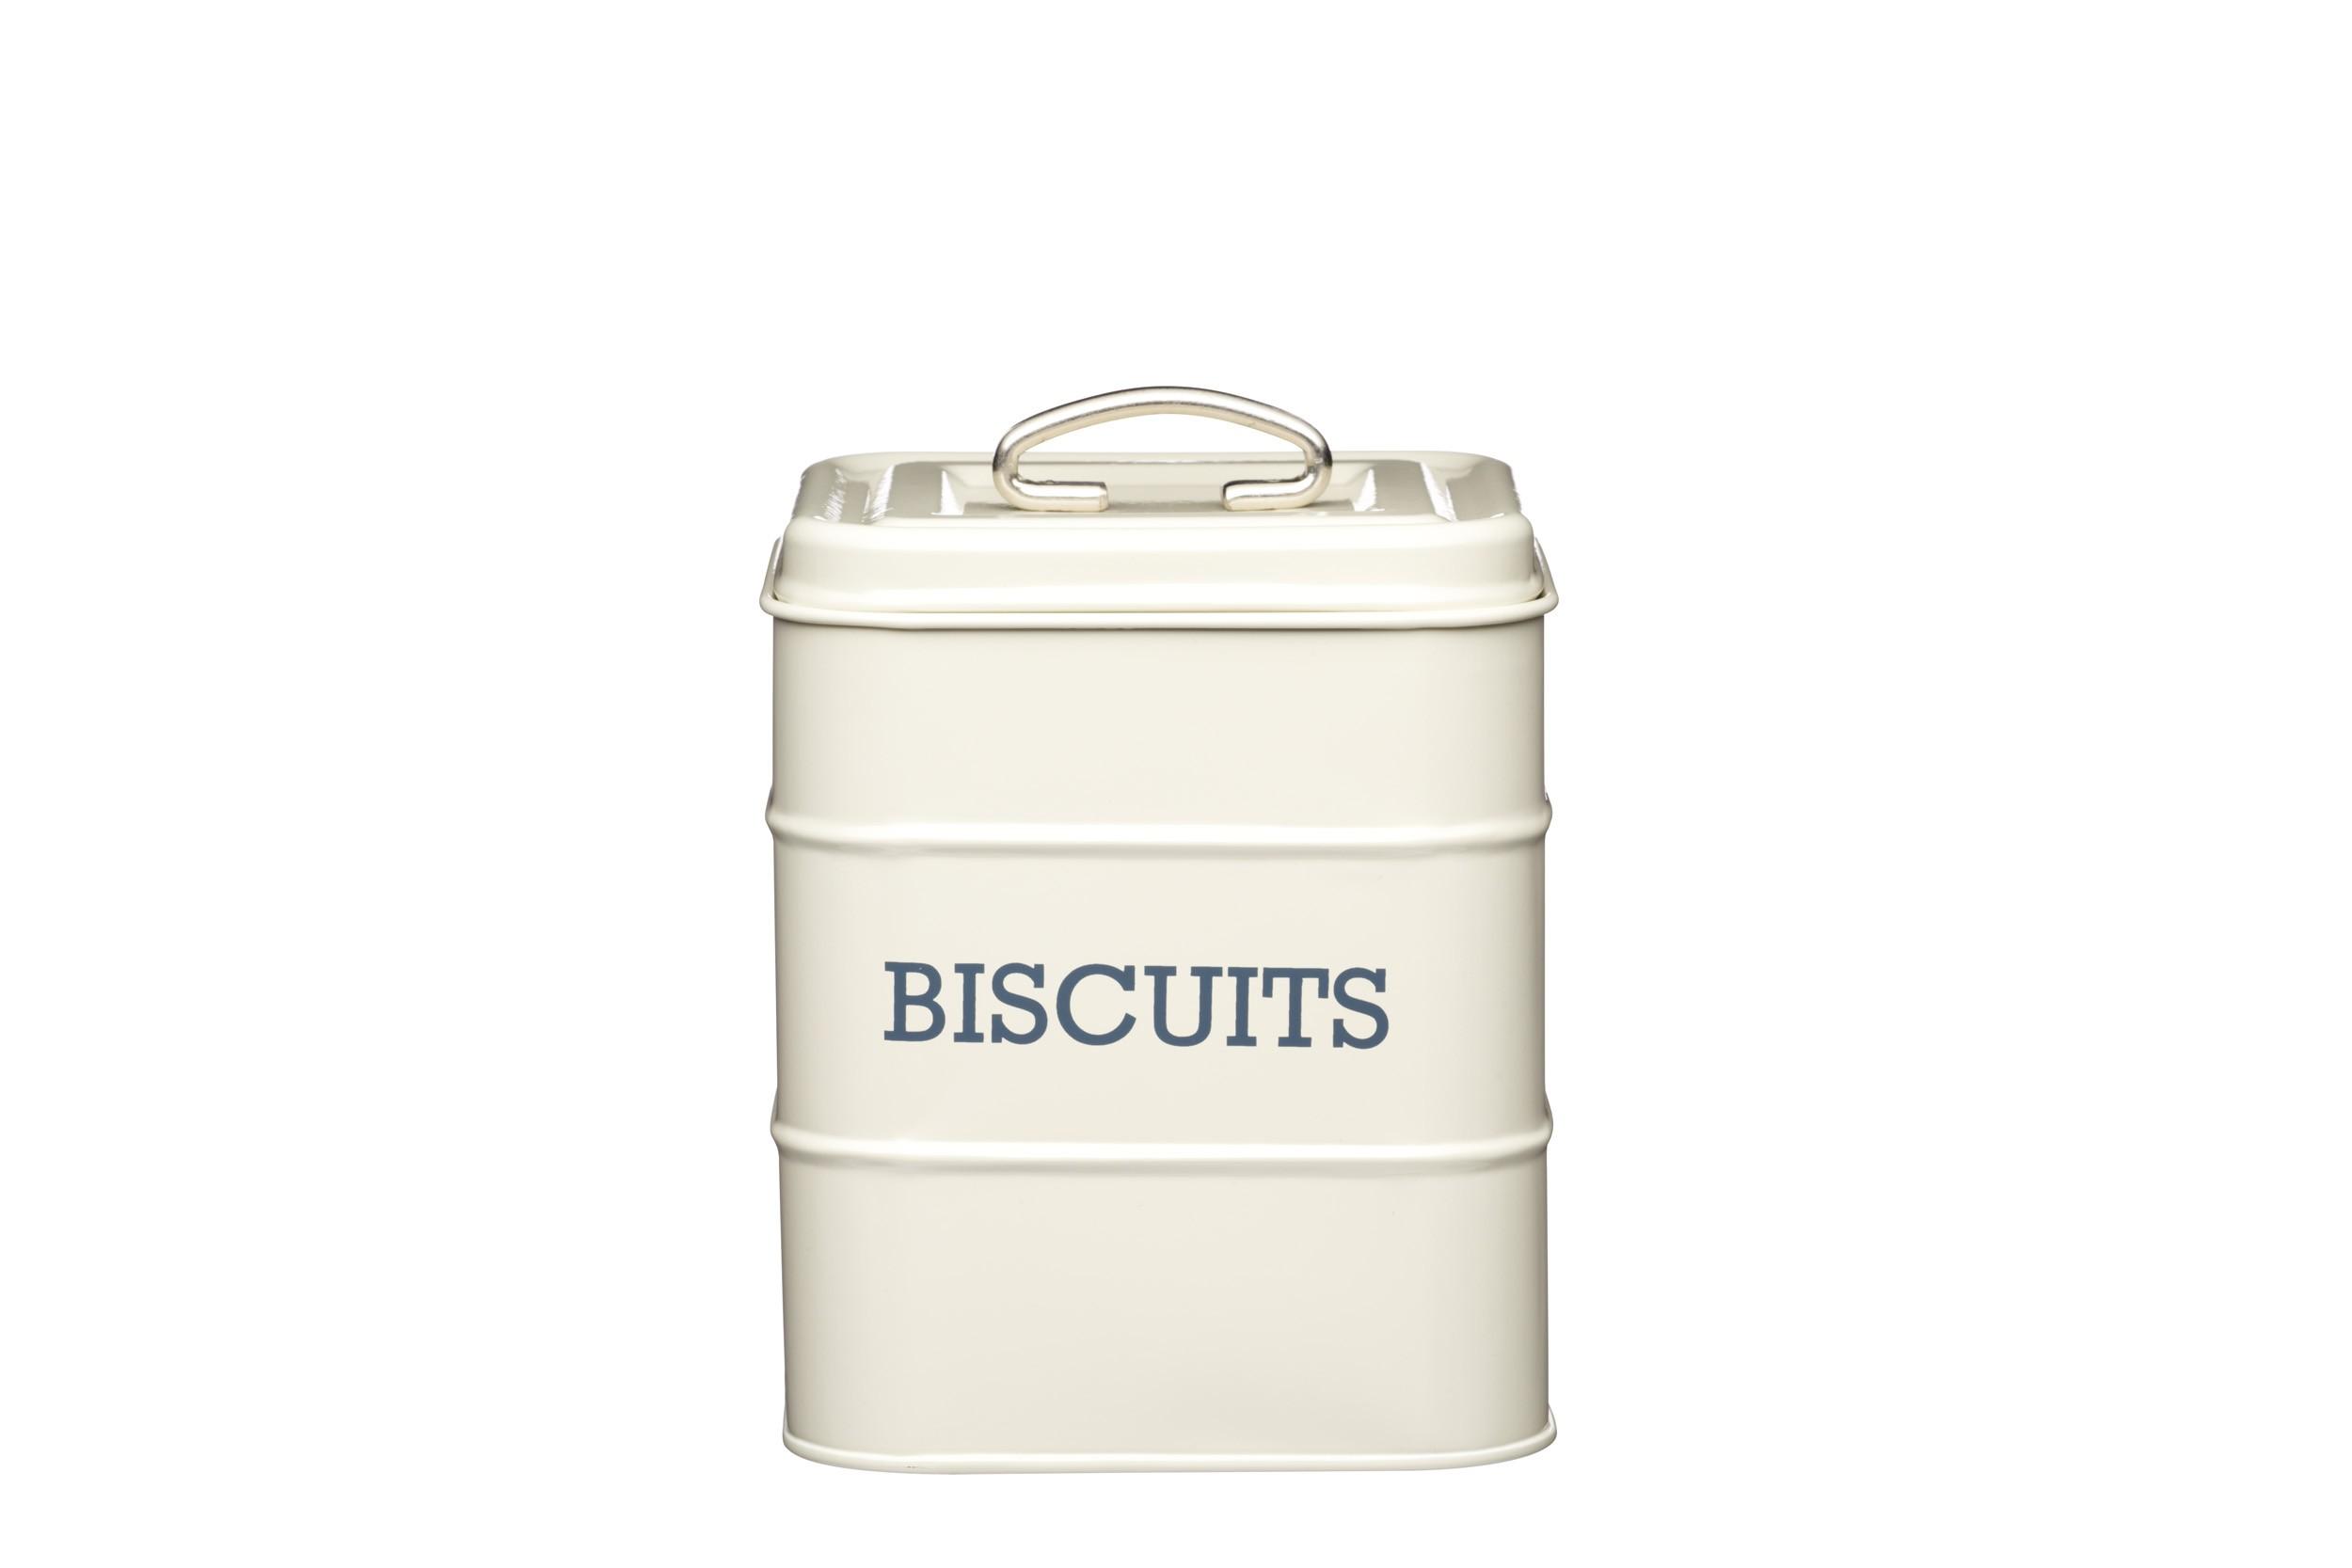 Kitchen Craft Living Nostalgia Biscuit Canister Cream 14.5cm X 19cm